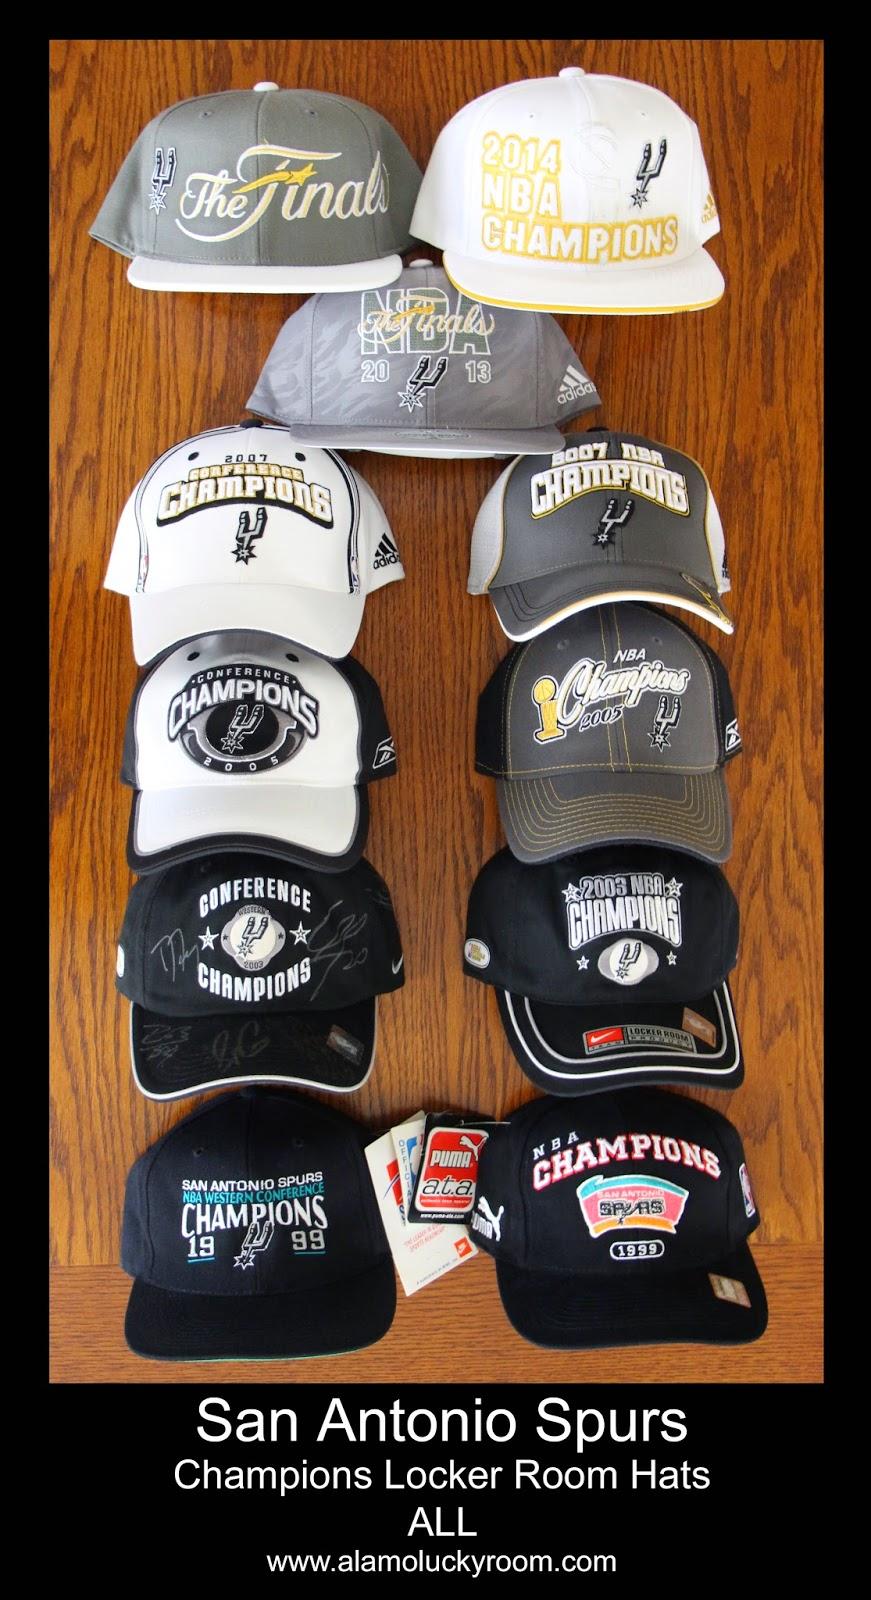 0d3a6c86051 San Antonio Spurs NBA Champions Locker Room Hats ALL